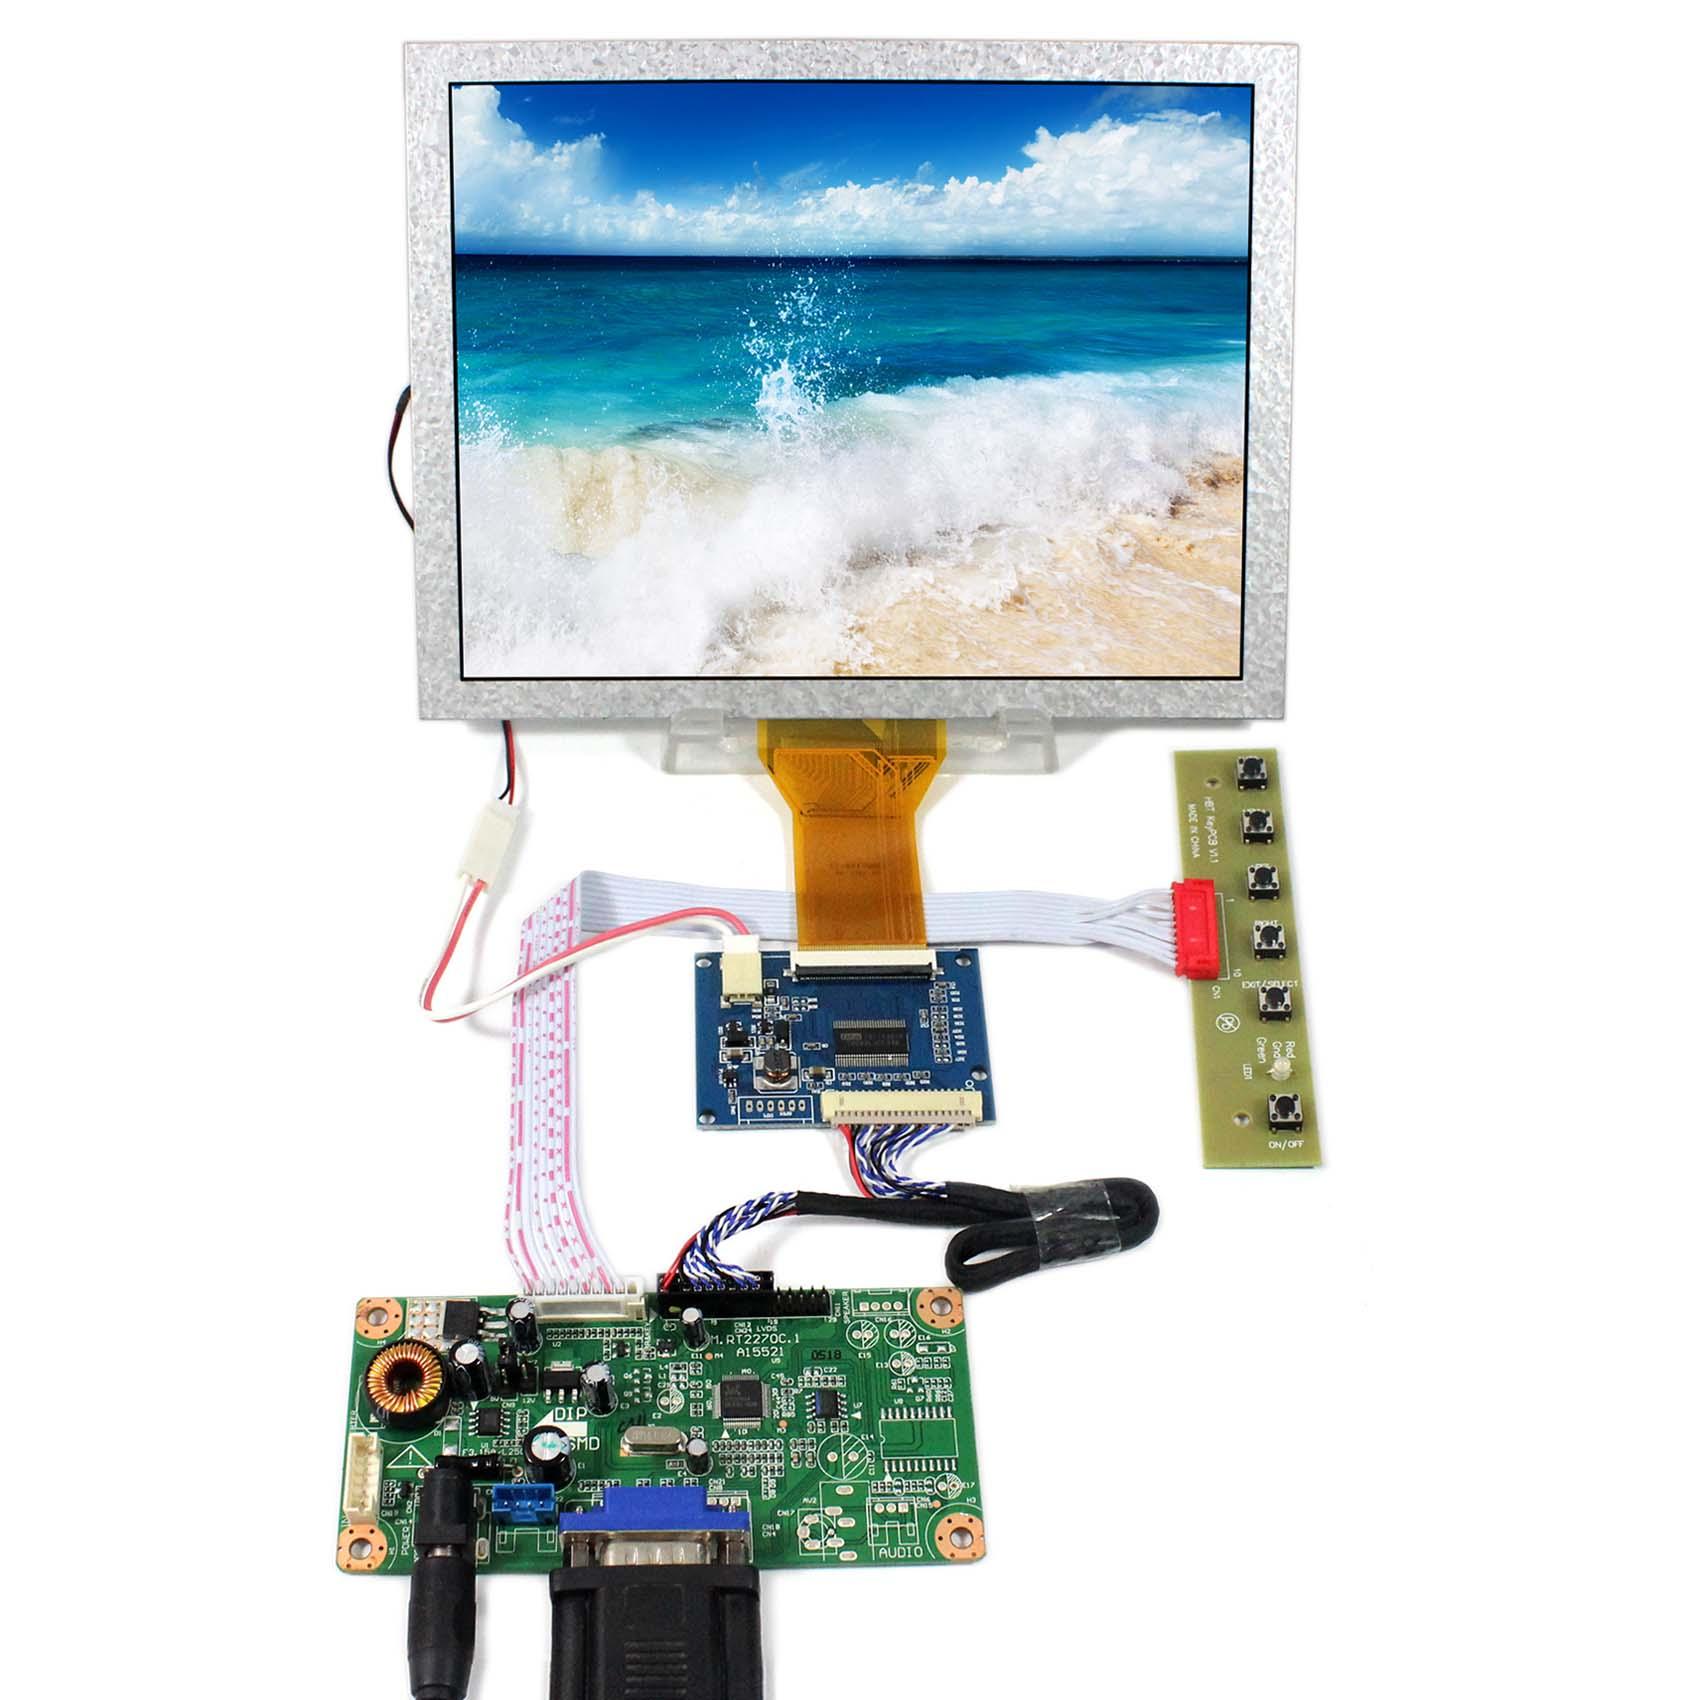 8 pulgadas EJ080NA-05A 800x600 LVDS a TTL Tcon con VGA LCD Cotnroller Junta RT2270C-A